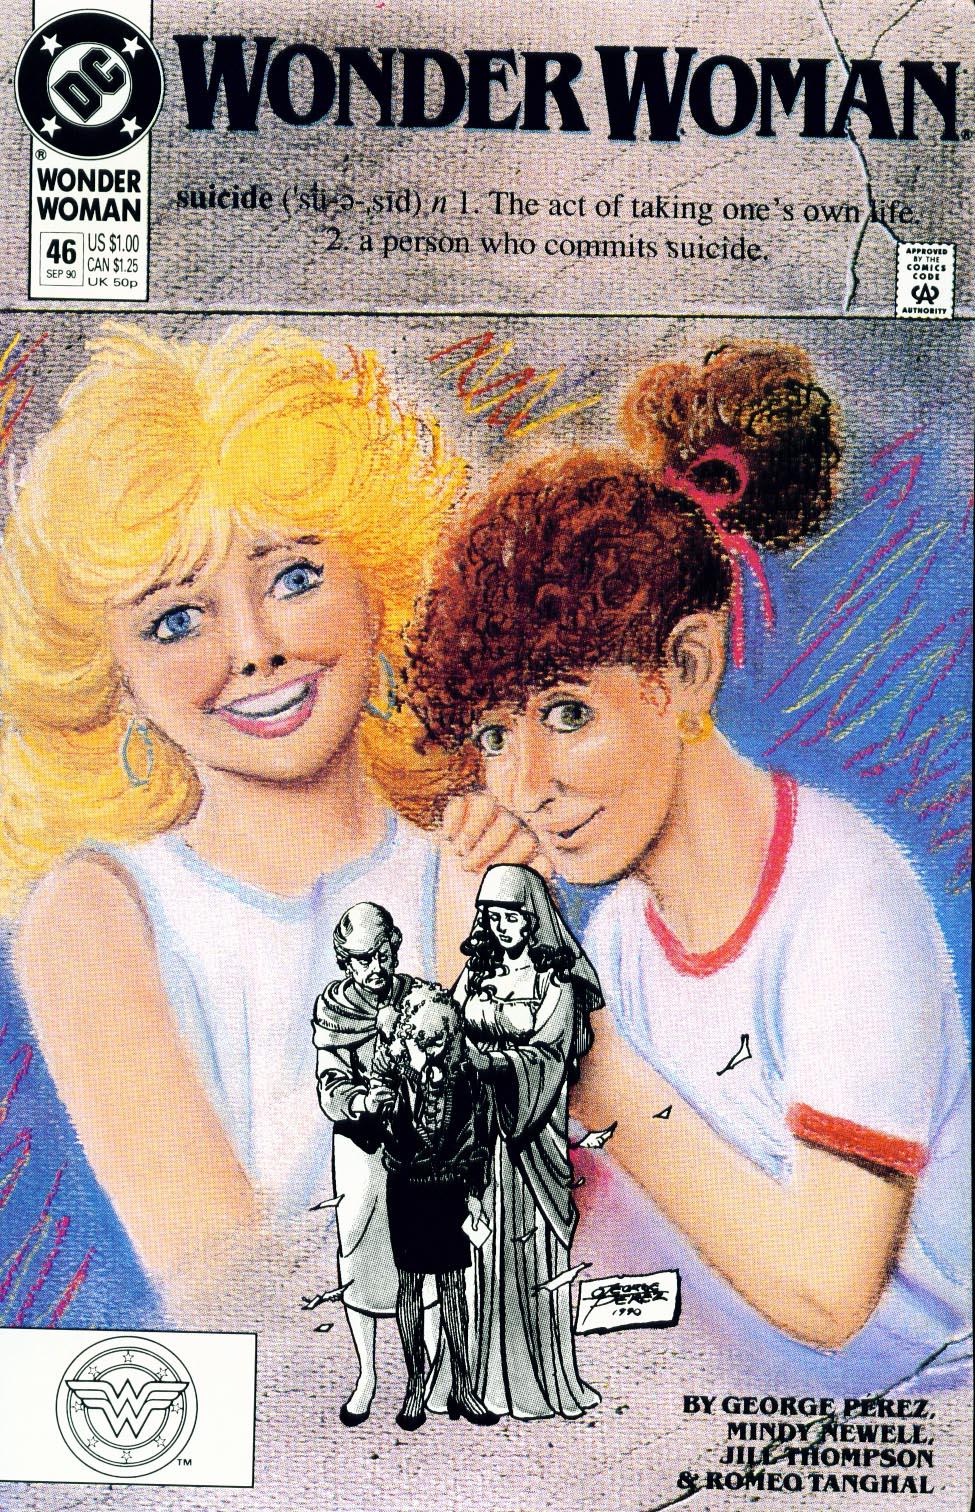 Read online Wonder Woman (1987) comic -  Issue #46 - 1